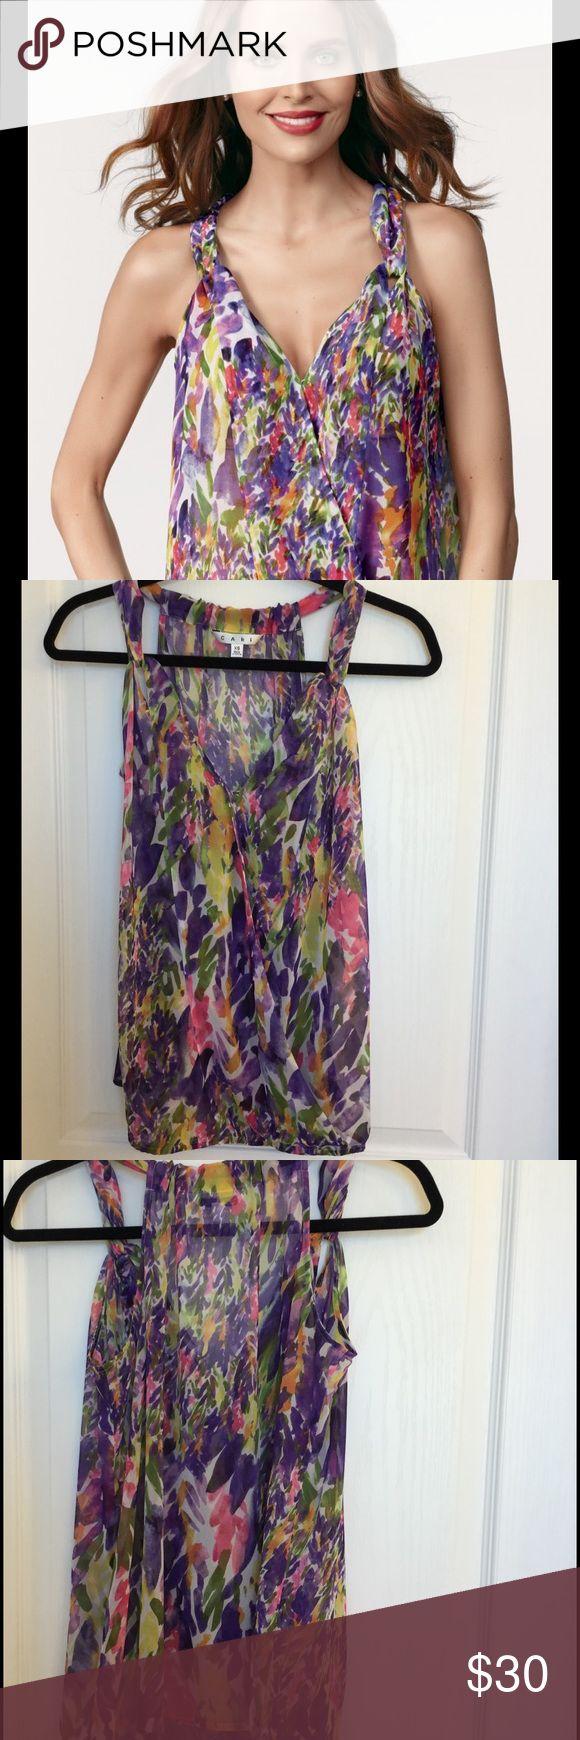 (CAbi) Petals floral chiffon drape front top (CAbi) Petals floral chiffon drape front top. CAbi Tops